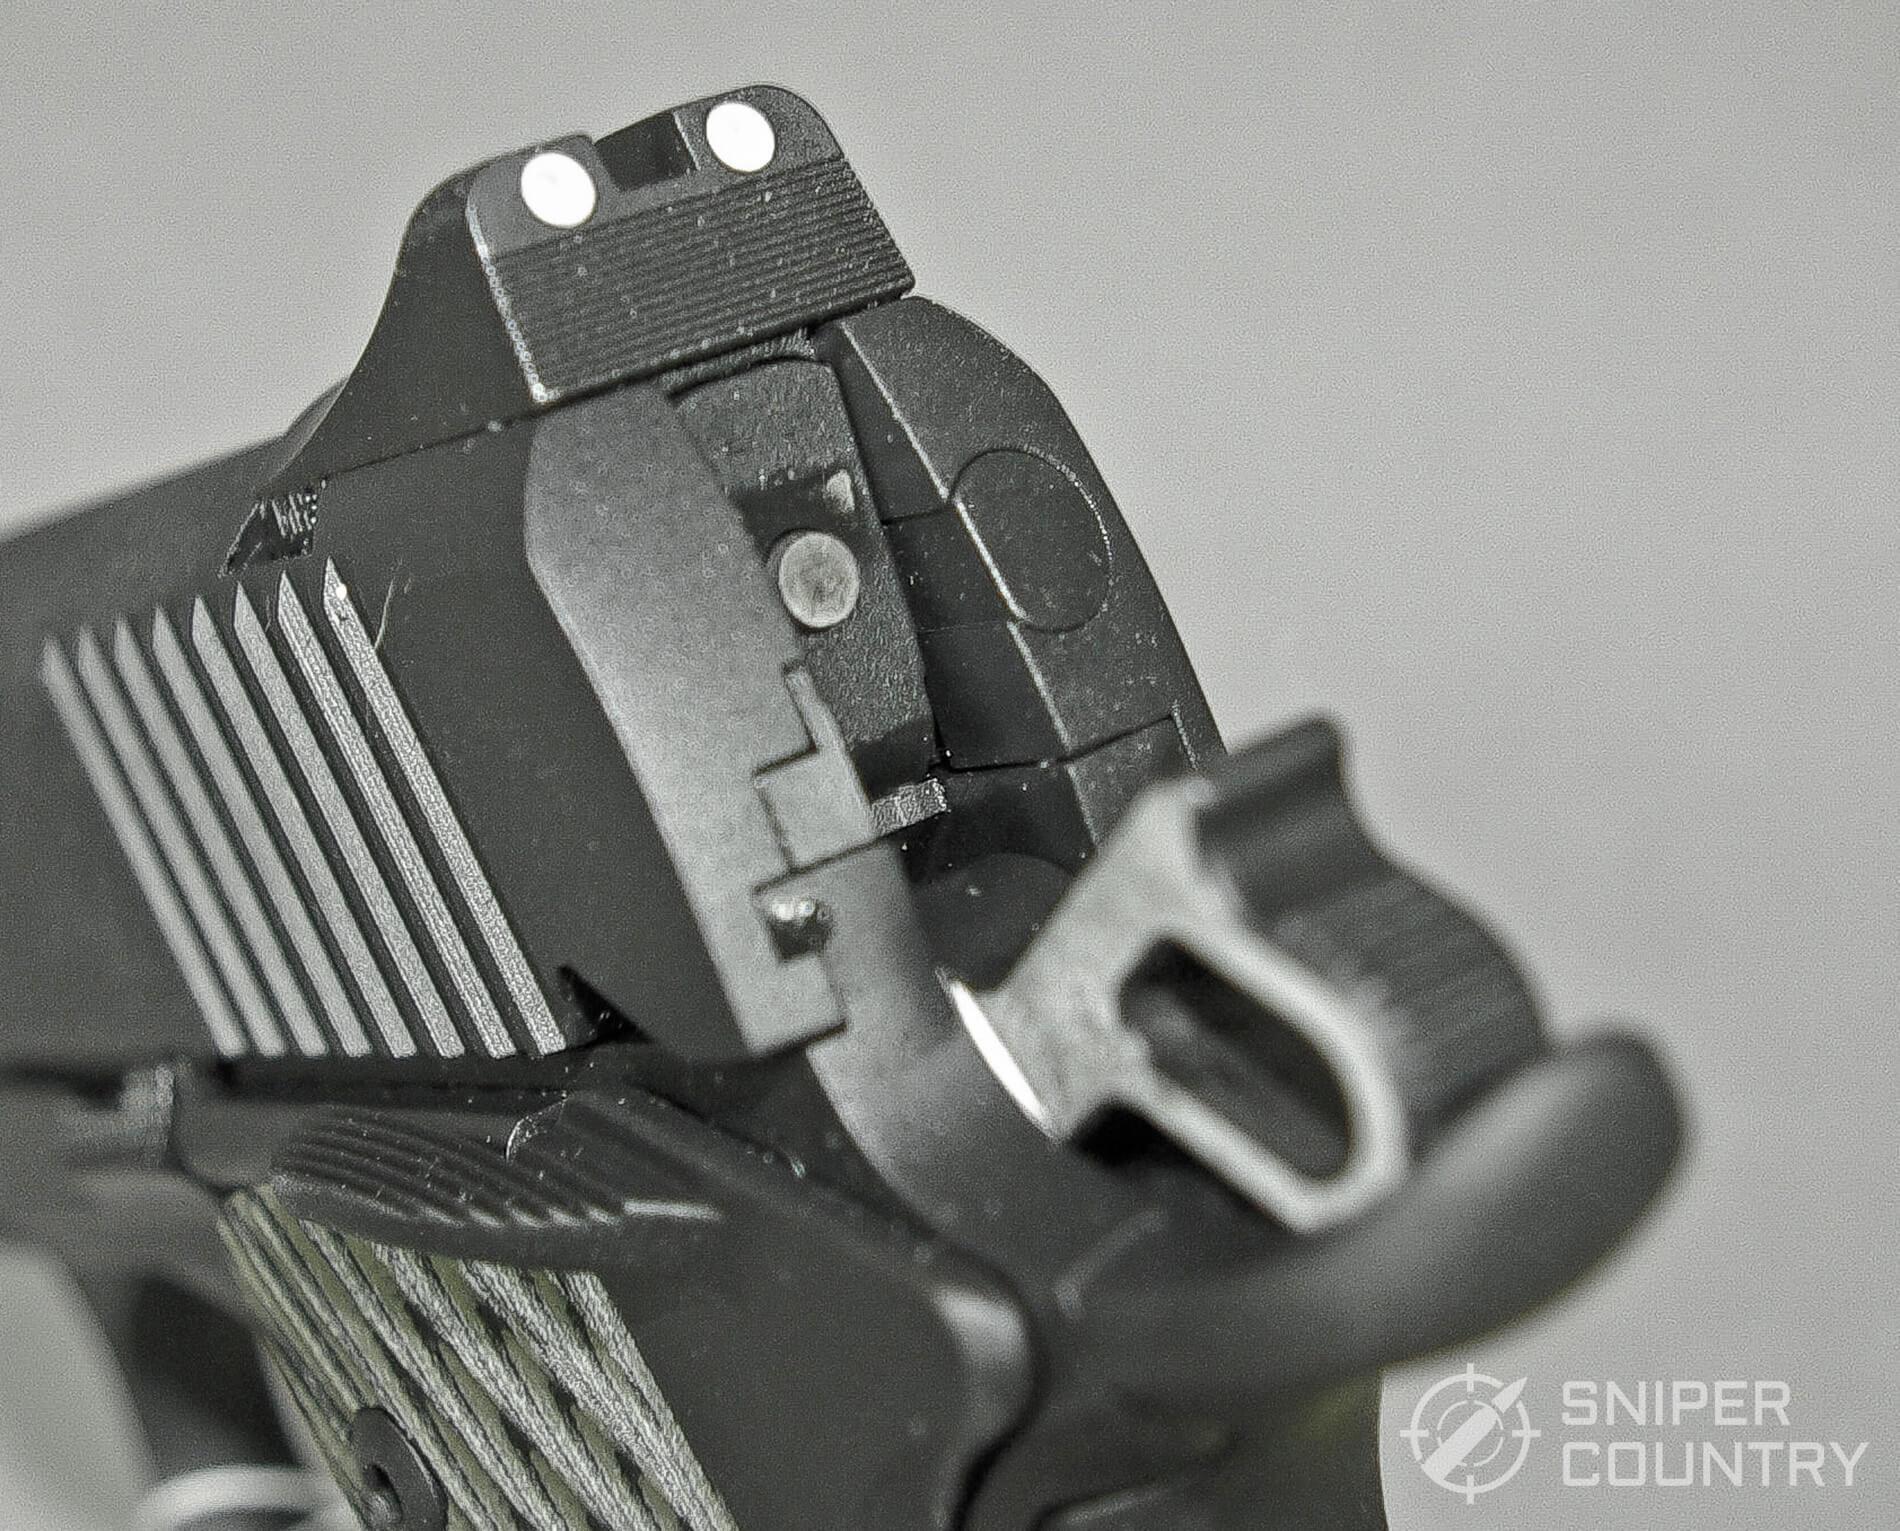 Best 10mm Pistols [2019] | Sniper Country